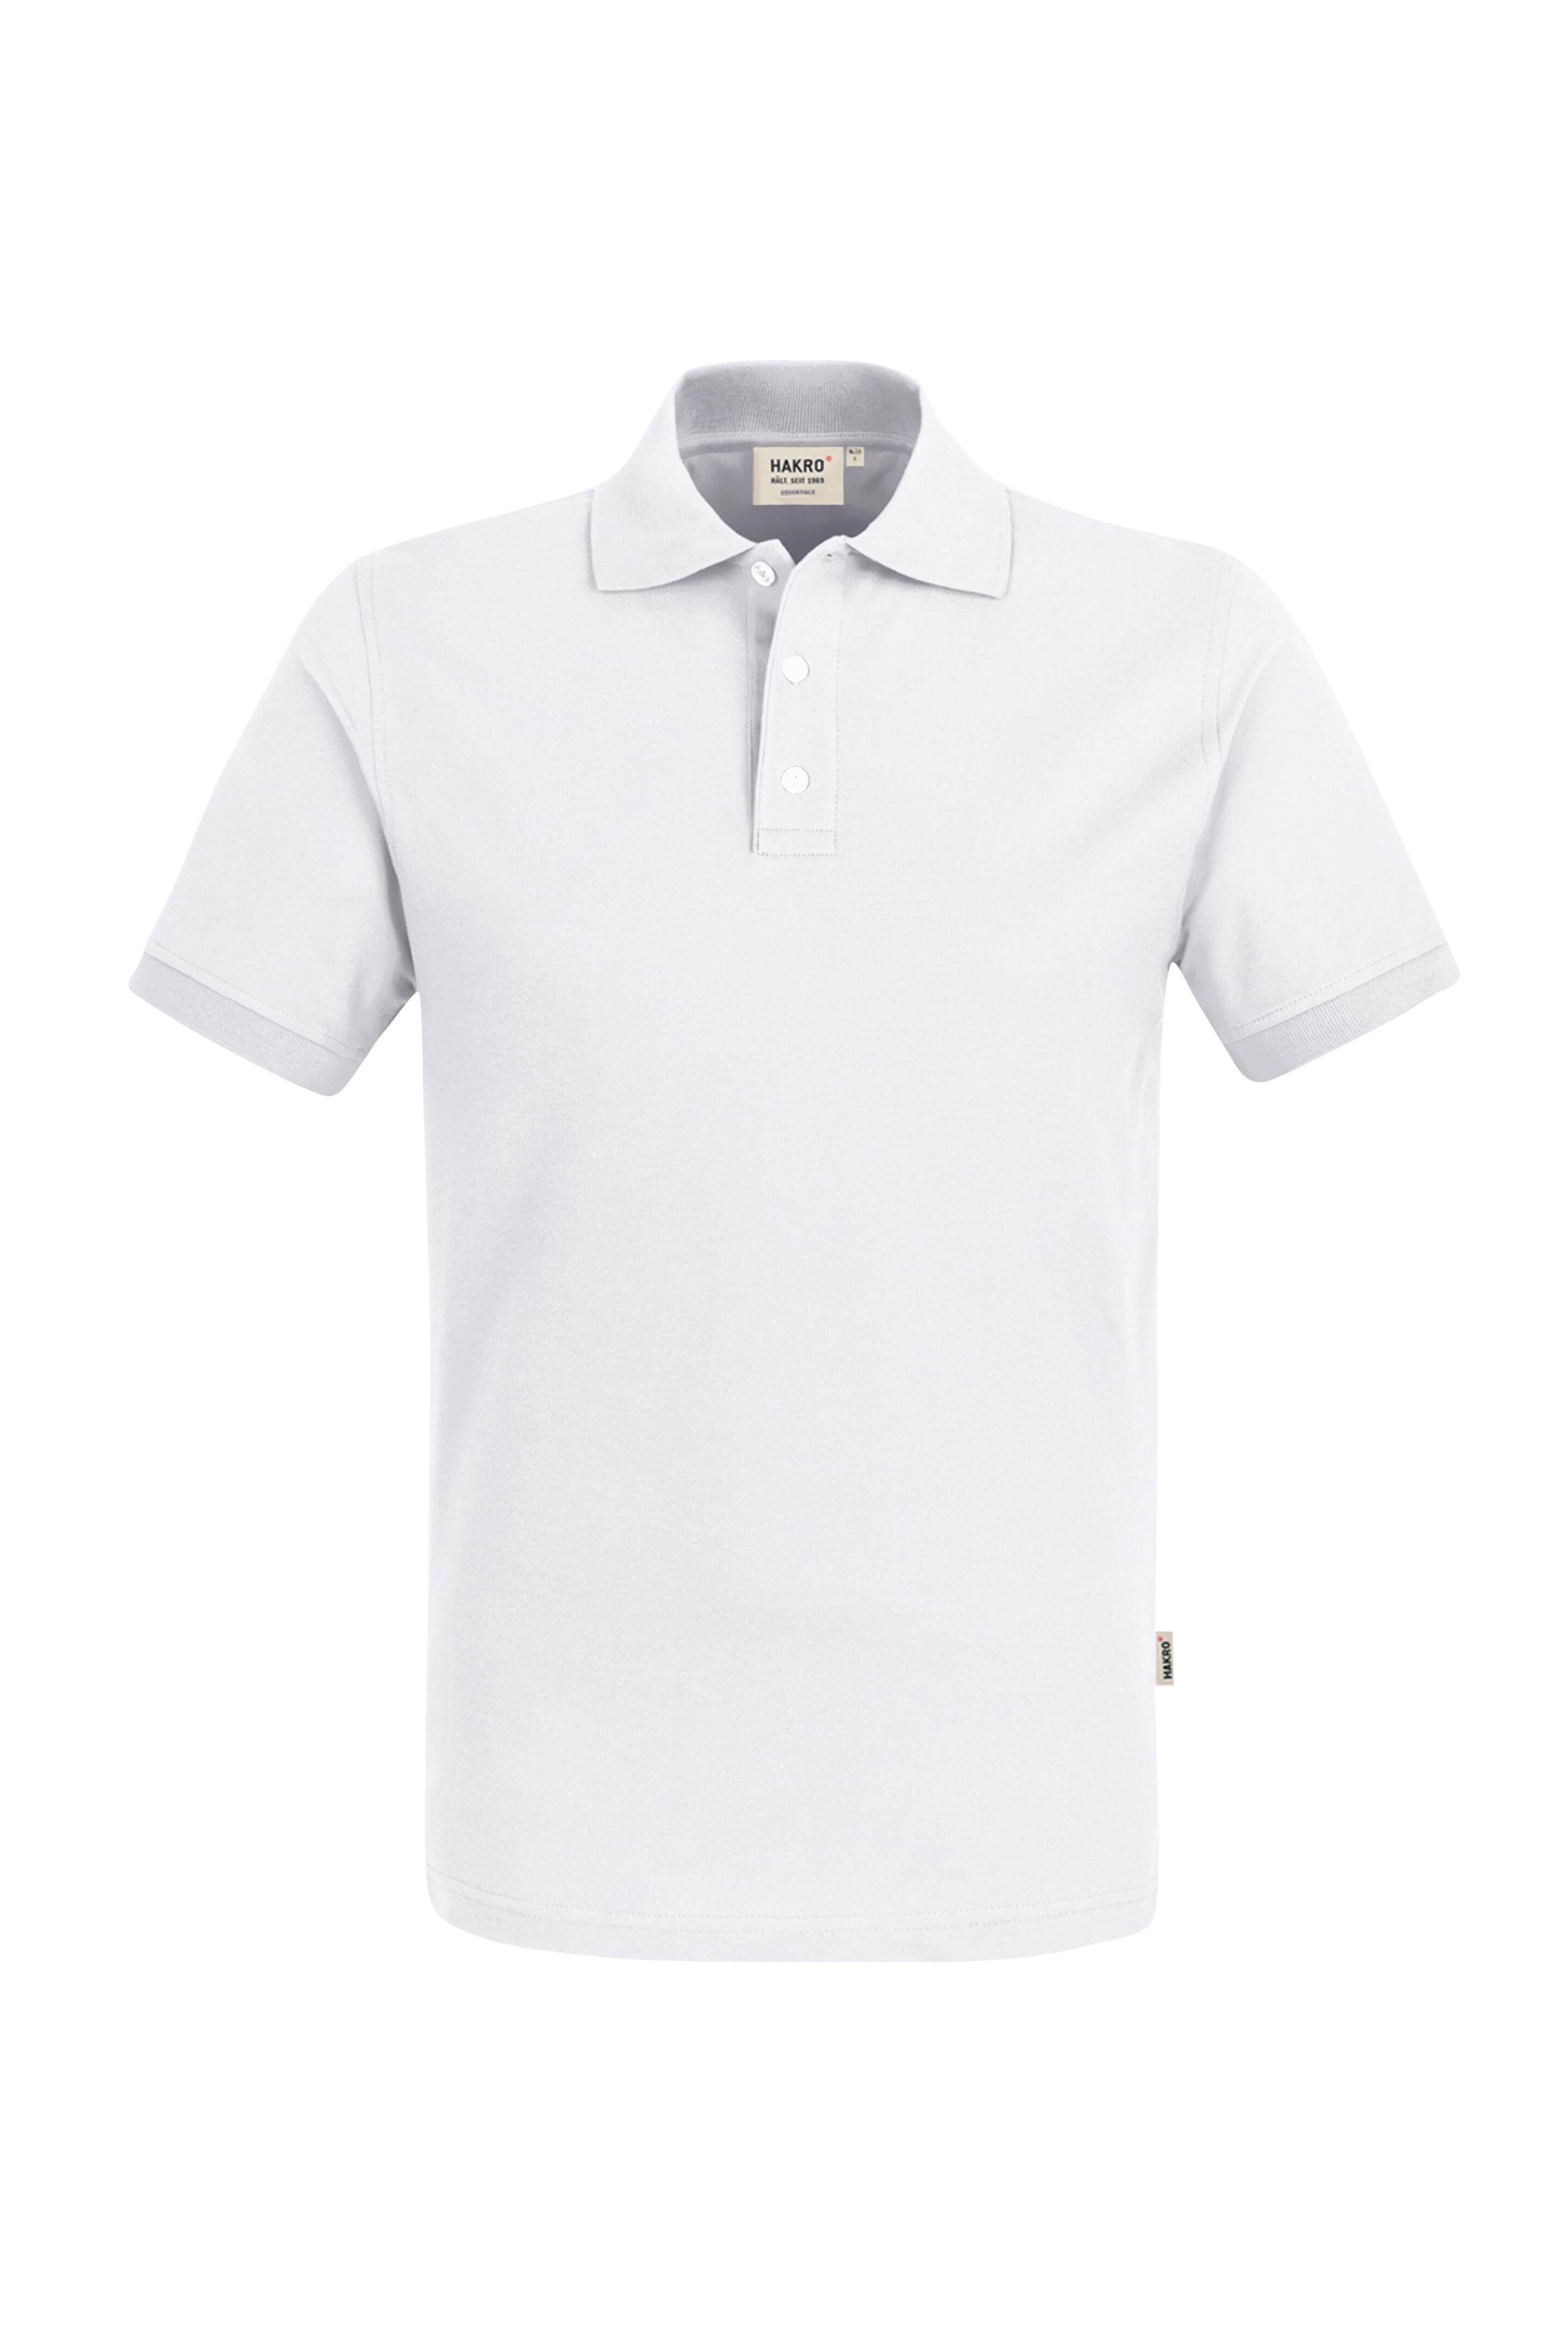 Hakro Poloshirt Stretch 822